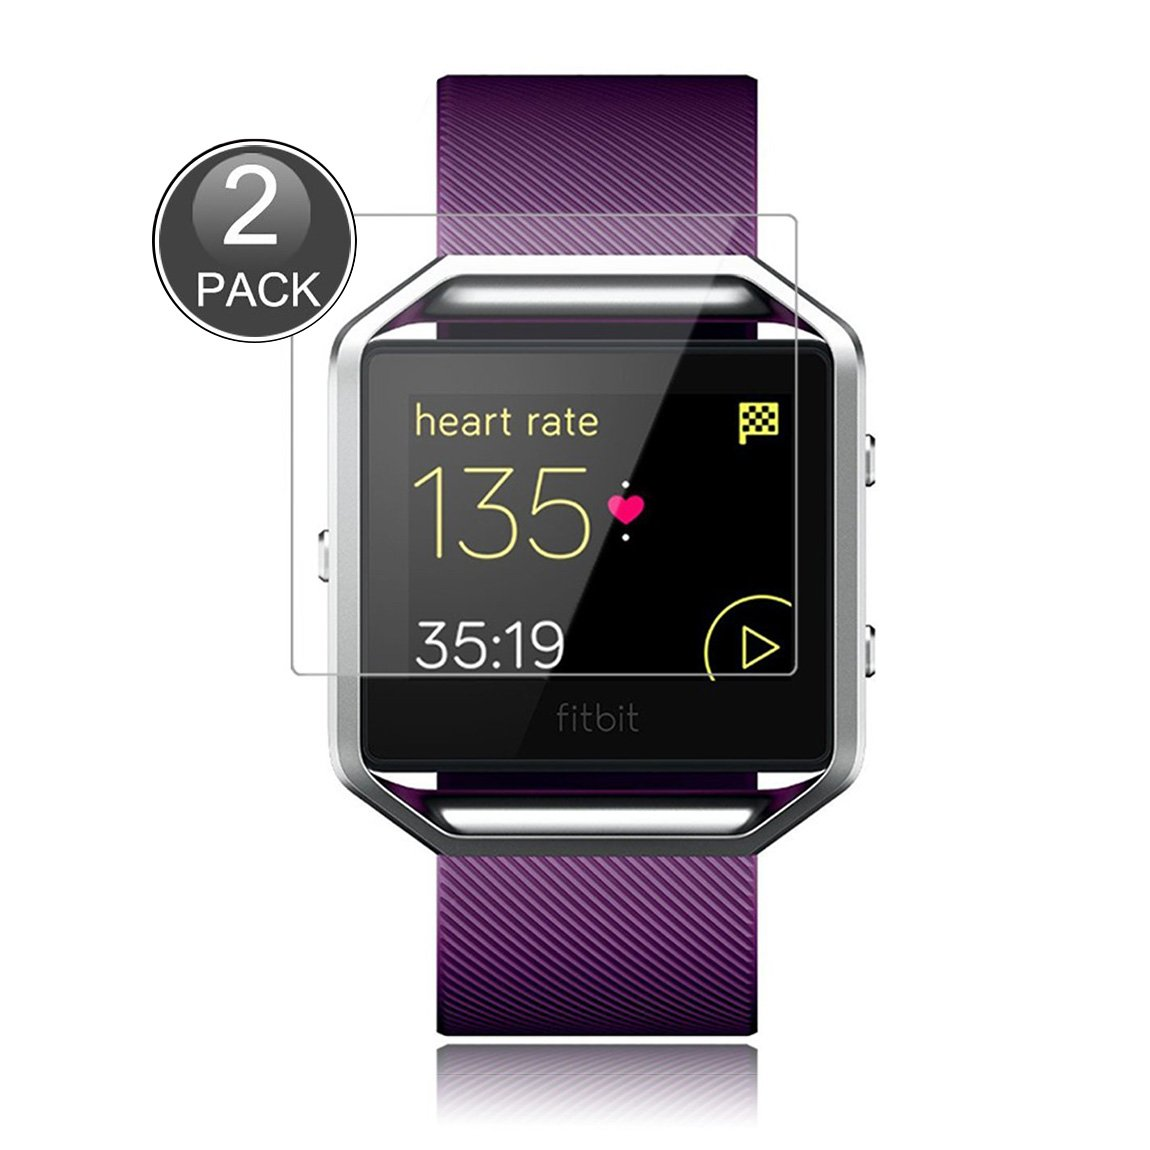 E-Hamii [2-Pack] Fitbit Blaze Protector de Pantalla, 0.26mm HD Anti-Scratch y Anti-huella digital Proteger la pelí cula, 9H Vidrio templado Cubierta protectora, Mejor protecció n 0.26mm HD Anti-Scratch y Anti-huella digital Proteger la pelícu